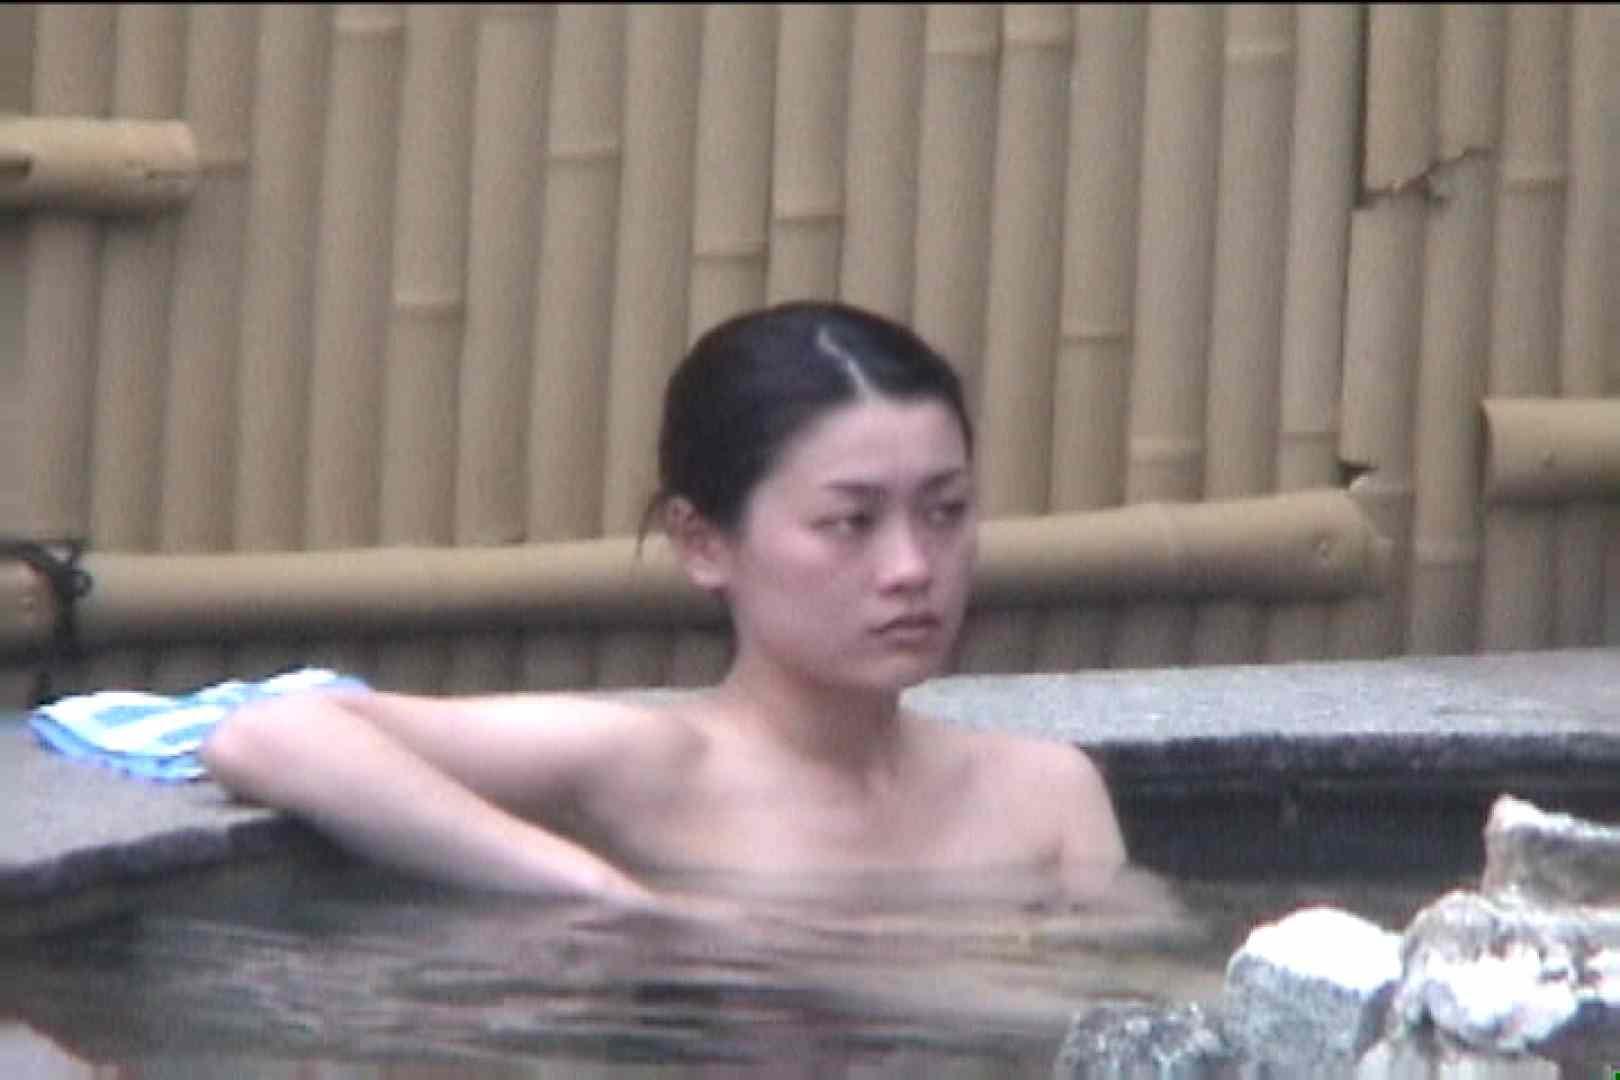 Aquaな露天風呂Vol.92【VIP限定】 露天風呂 盗撮動画紹介 33連発 2